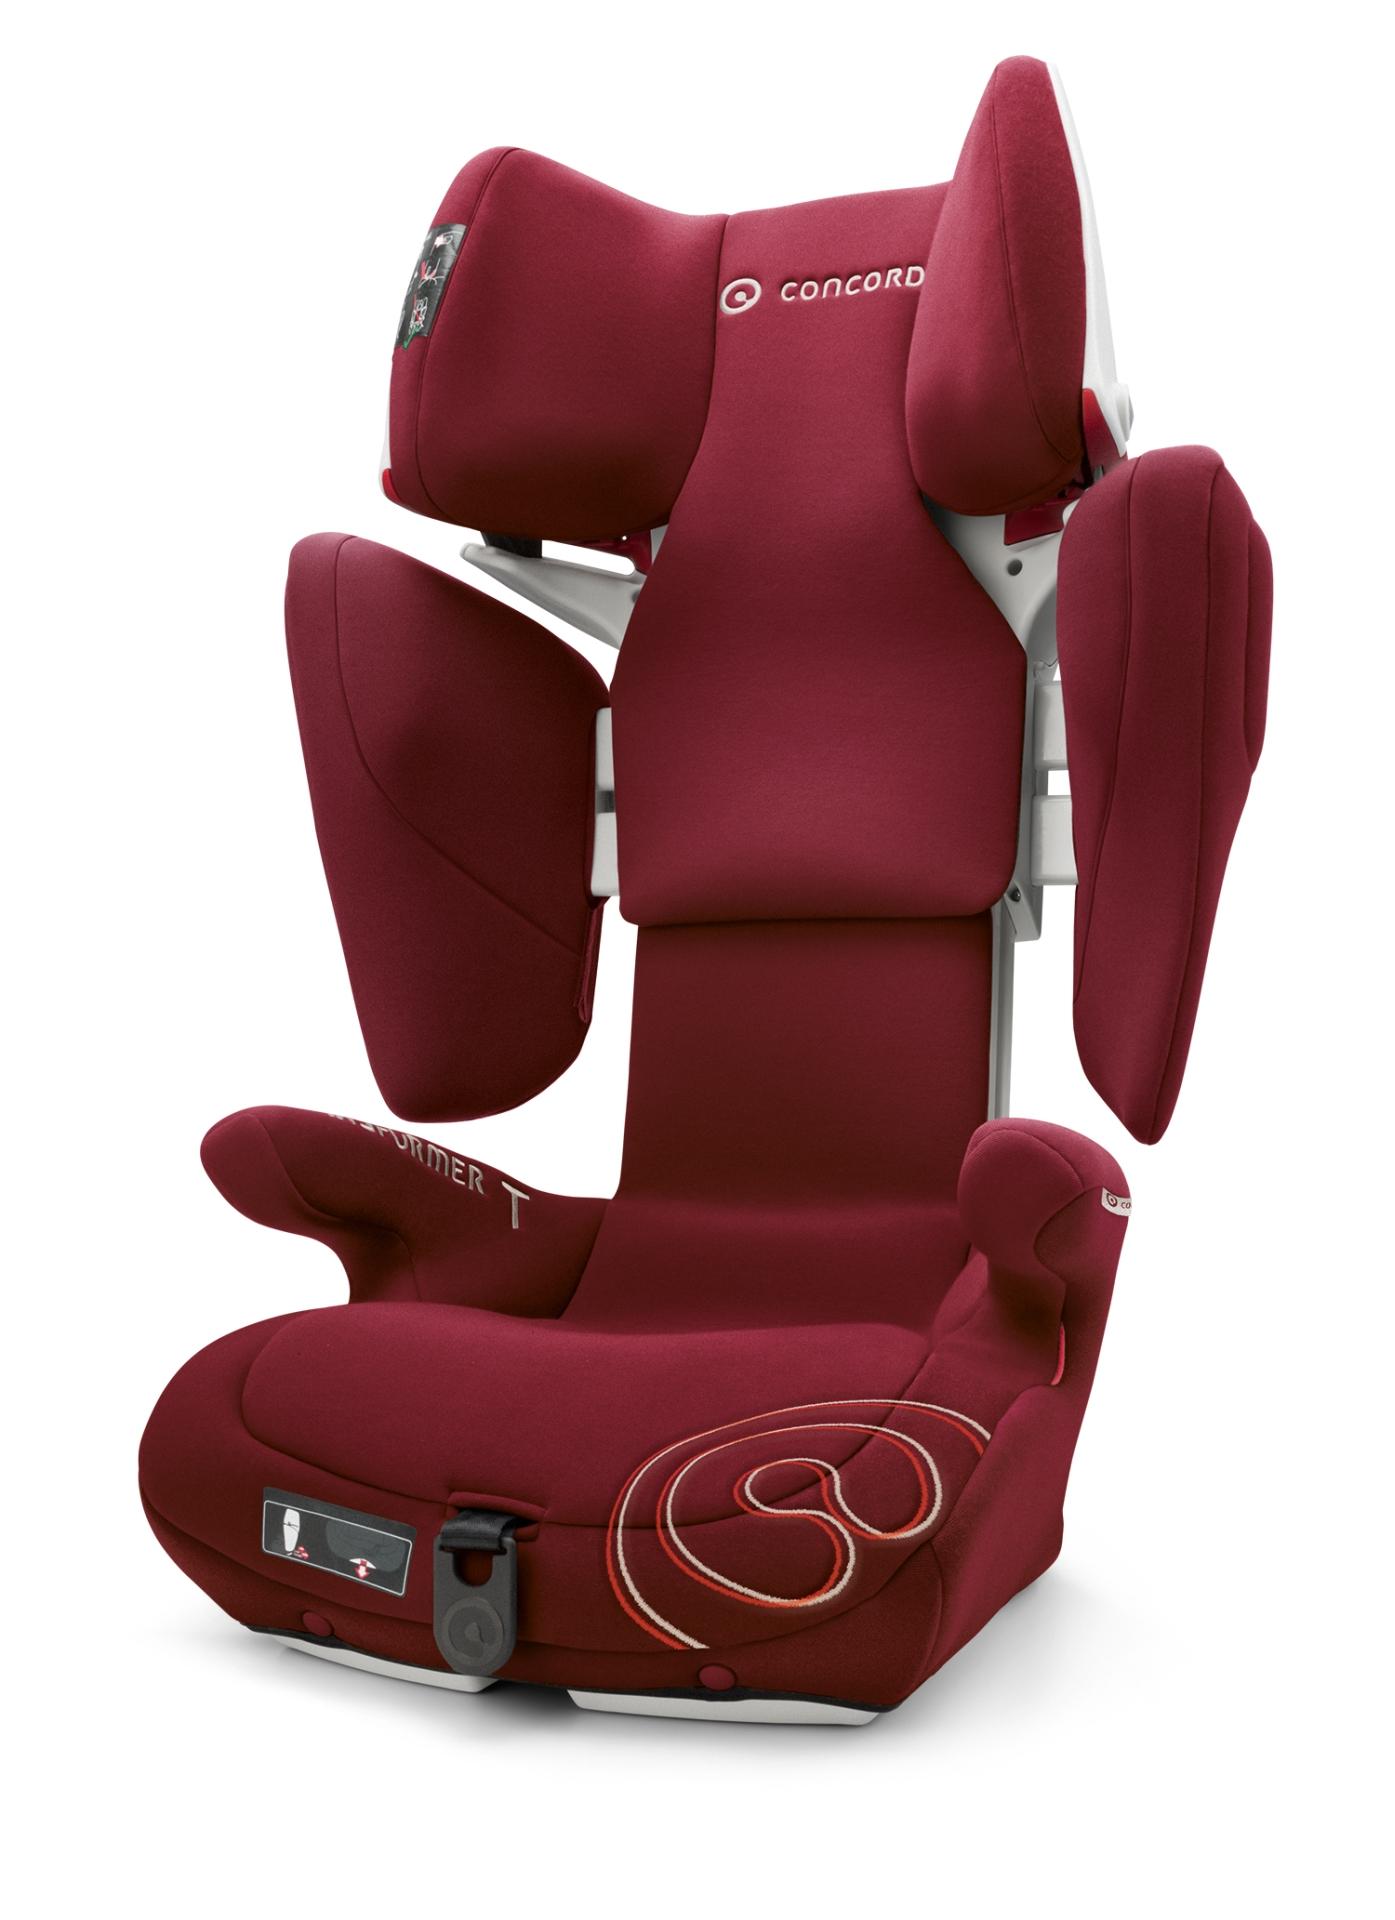 Concord 兒童汽車安全座椅 Transformer T 2017 Bordeaux Red kidsroom德國直郵母嬰用品網店   兒童汽車安全座椅   兒童汽車 ...